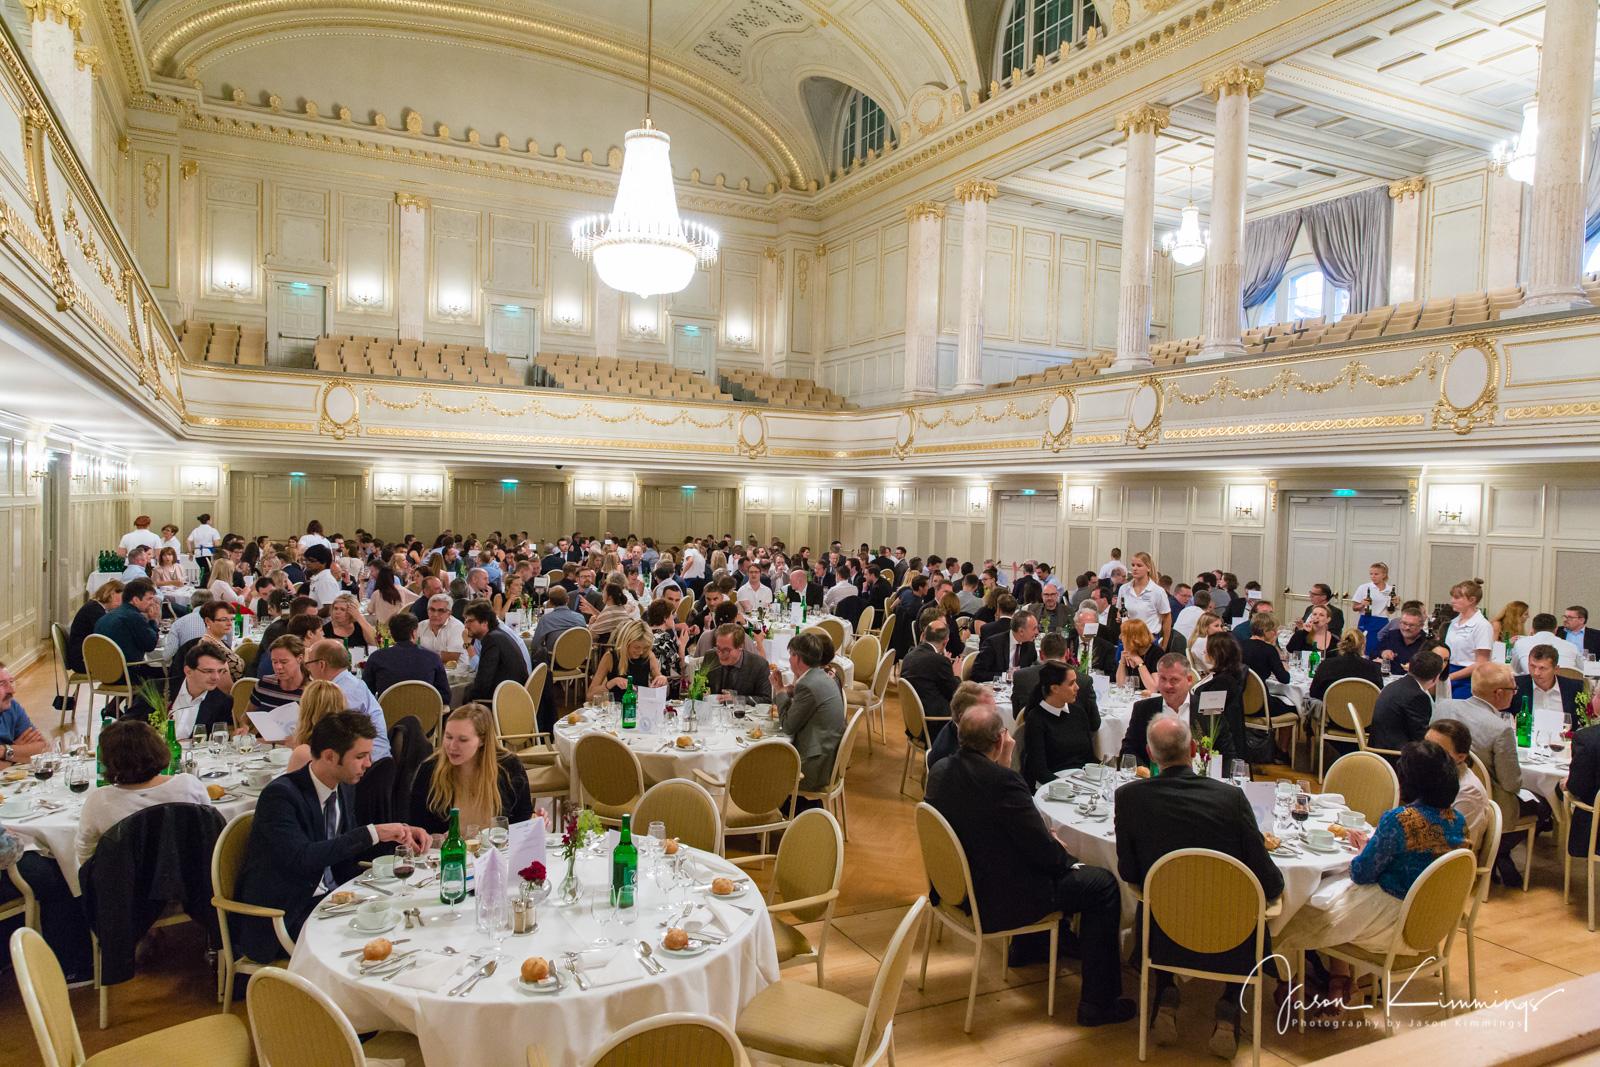 Conference-event-photography-west-lothian-edinburgh-glasgow-28.jpg